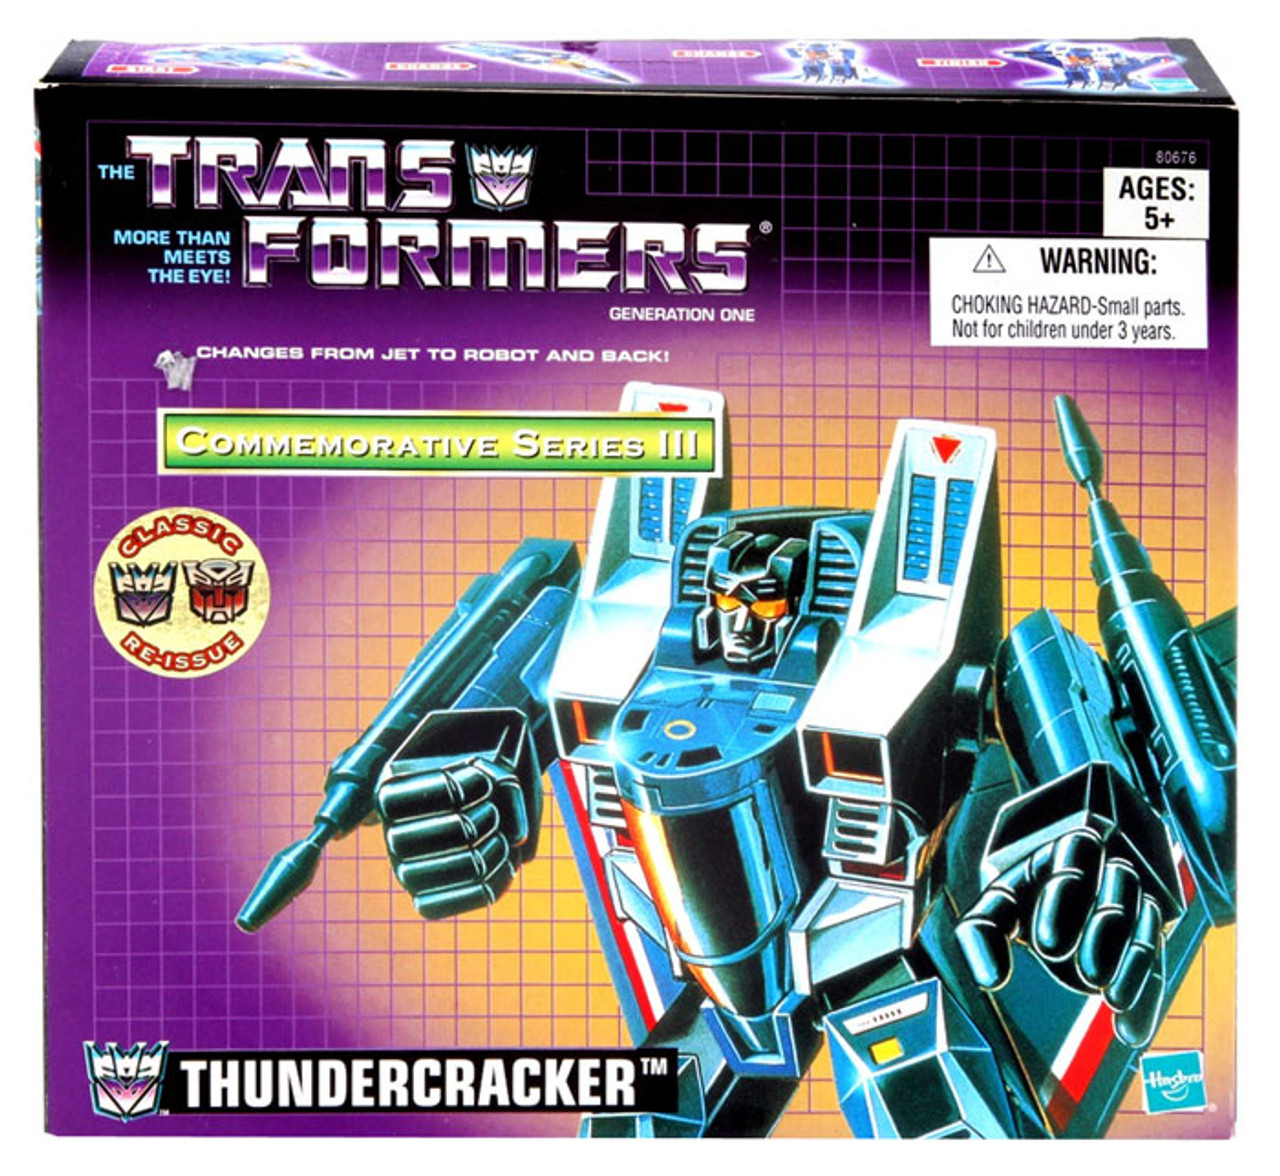 Transformers Generation 1 Commemorative Series III Thundercracker Action Figure